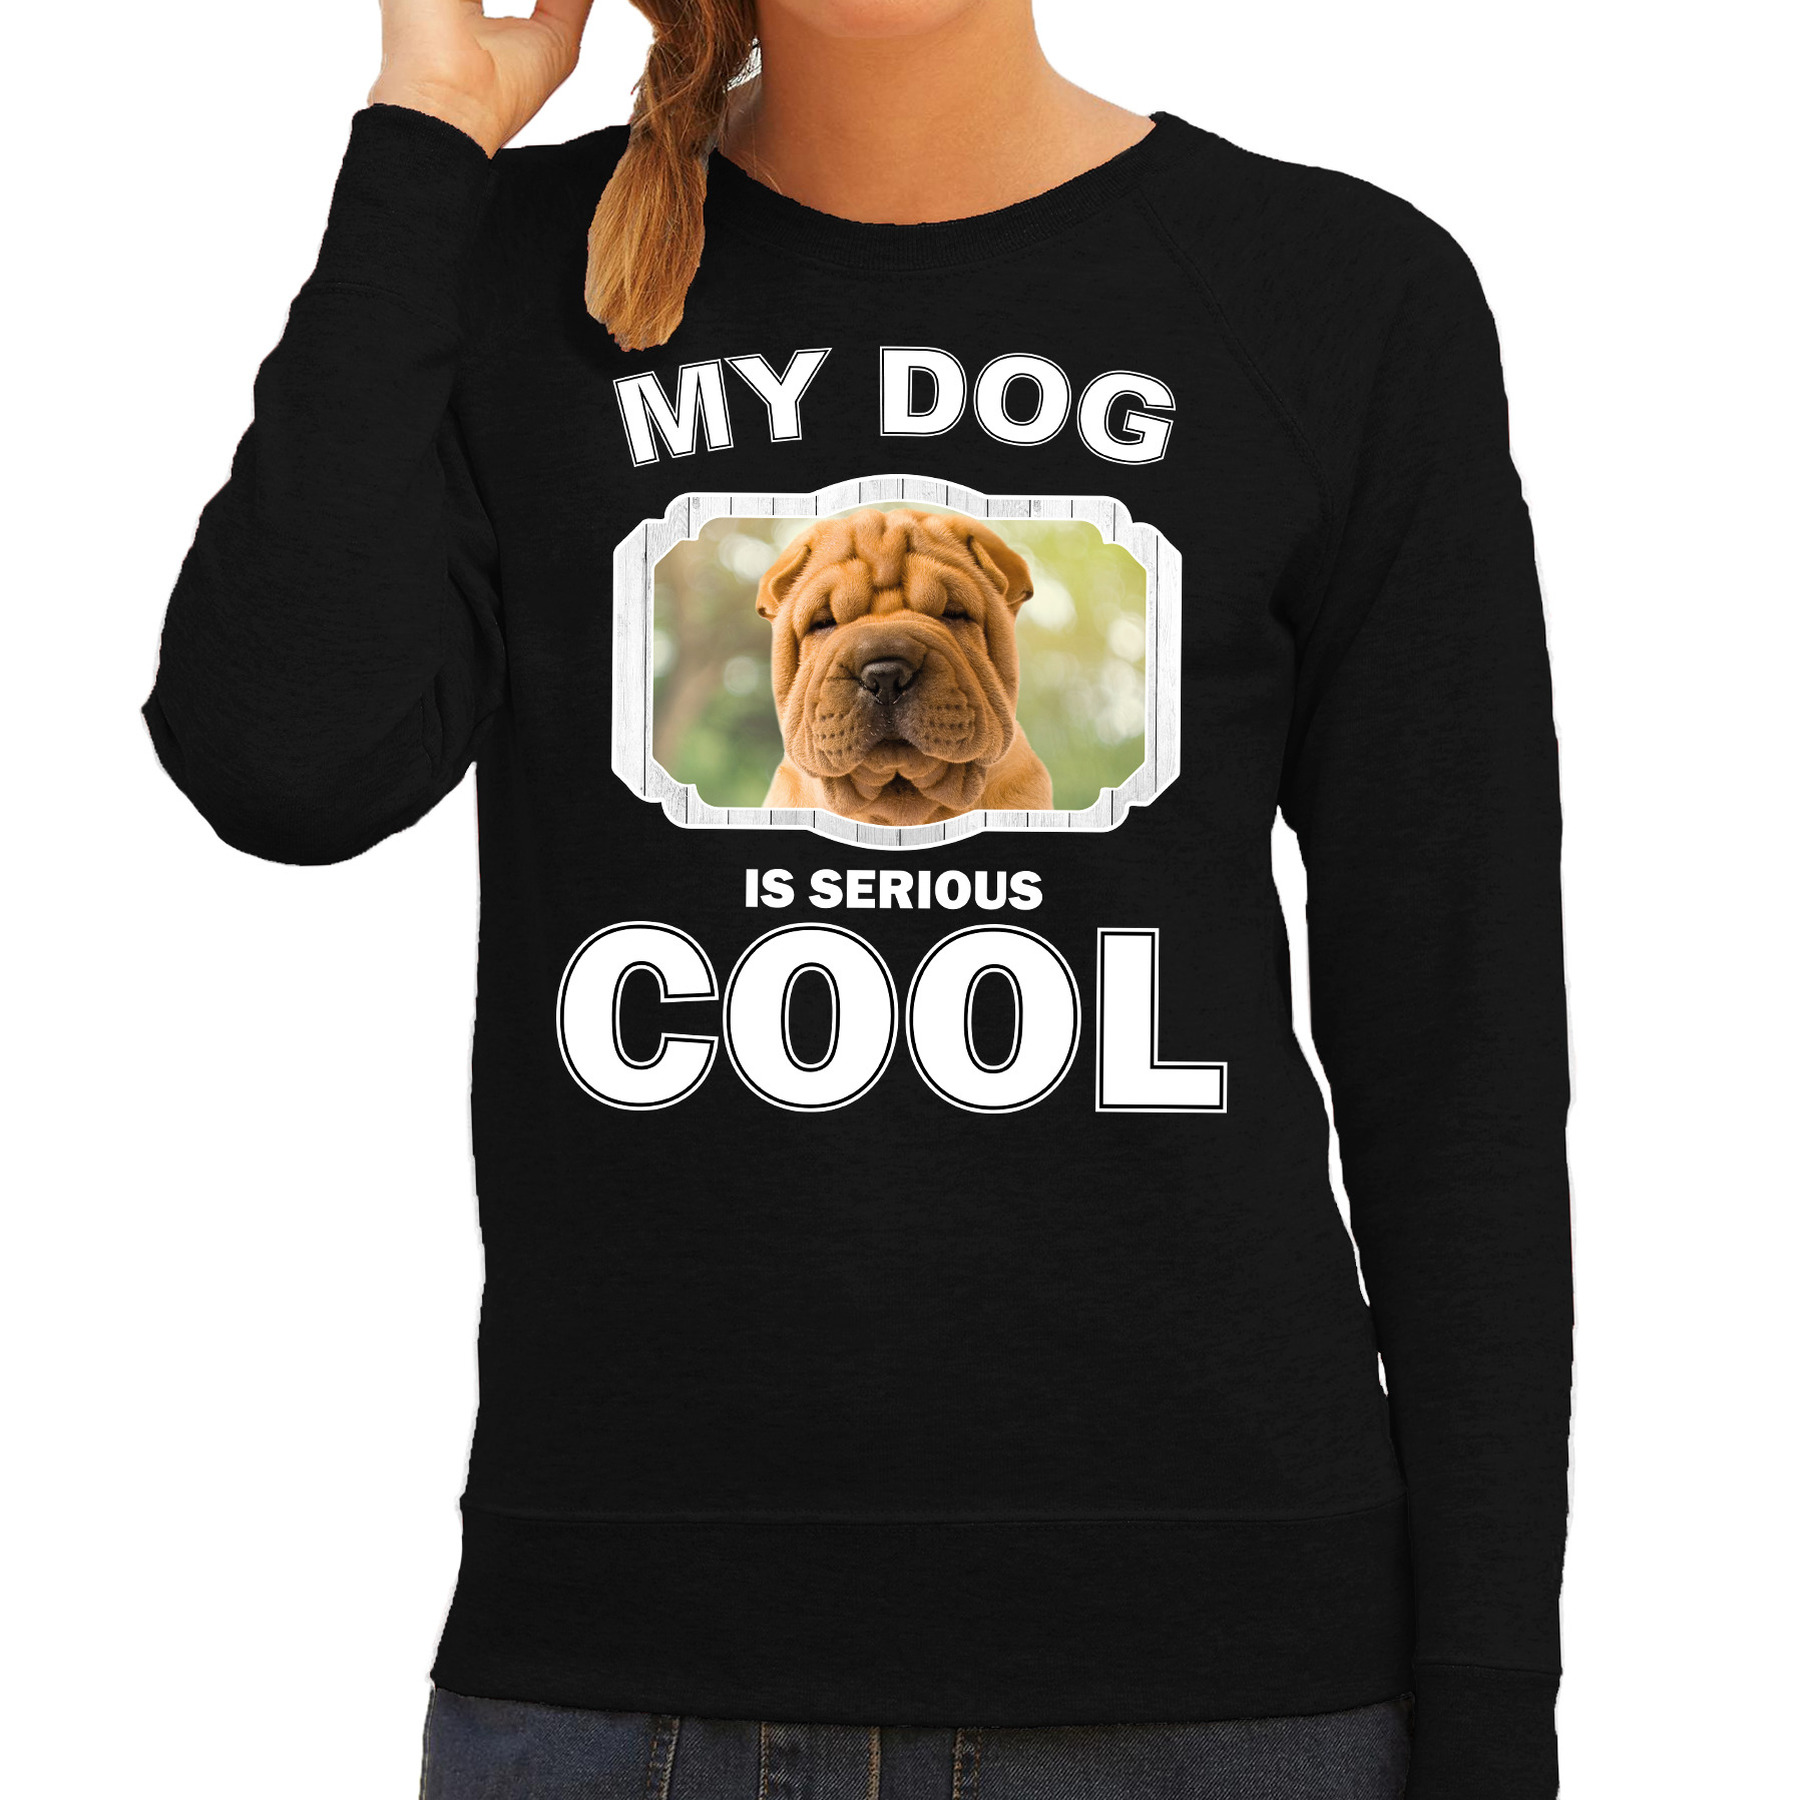 Honden liefhebber trui / sweater Shar pei my dog is serious cool zwart voor dames